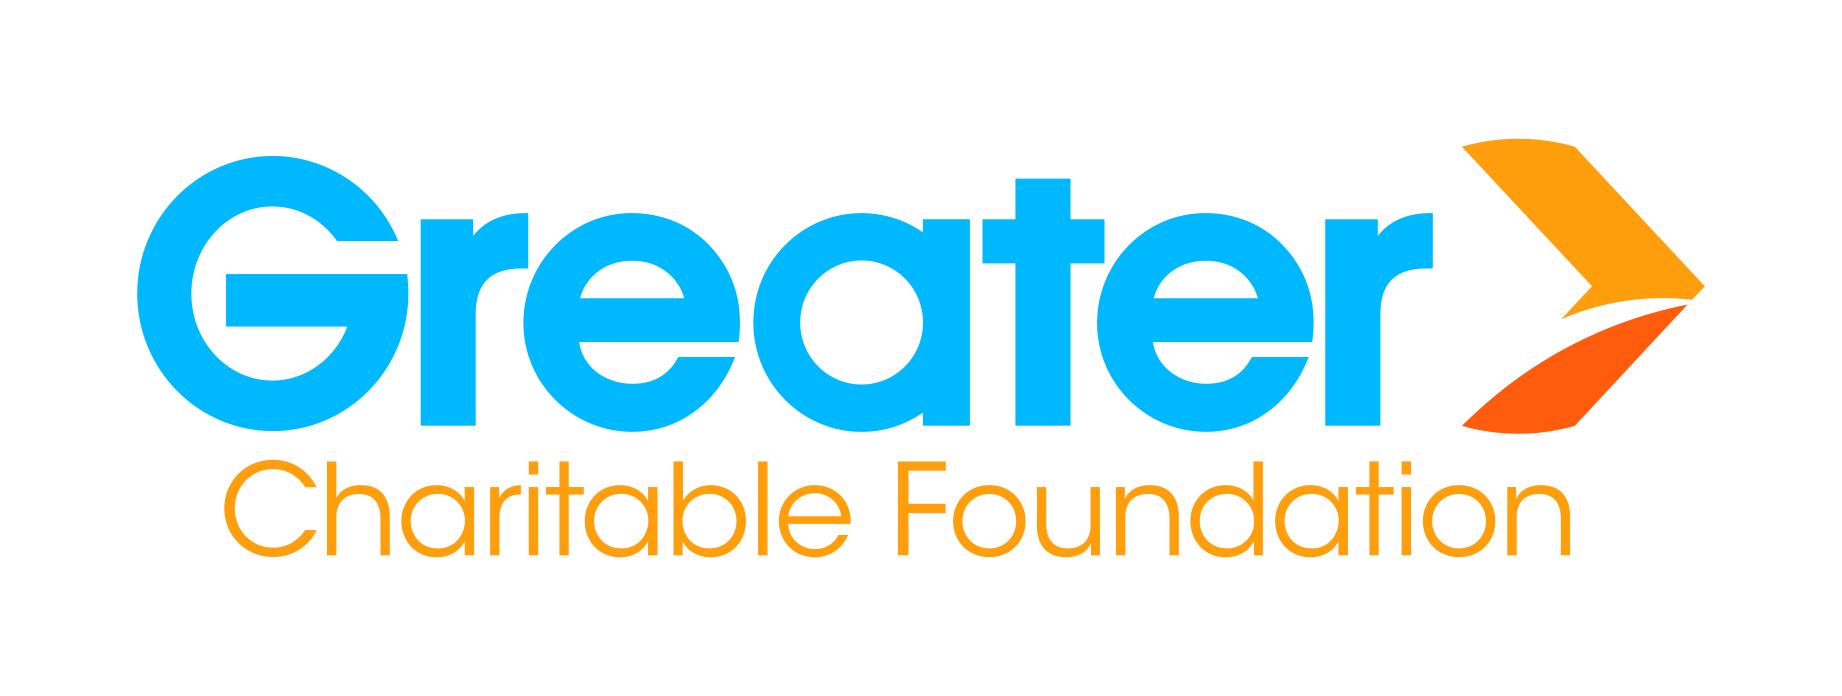 GreaterCharitableFoundation_CMYK.jpg